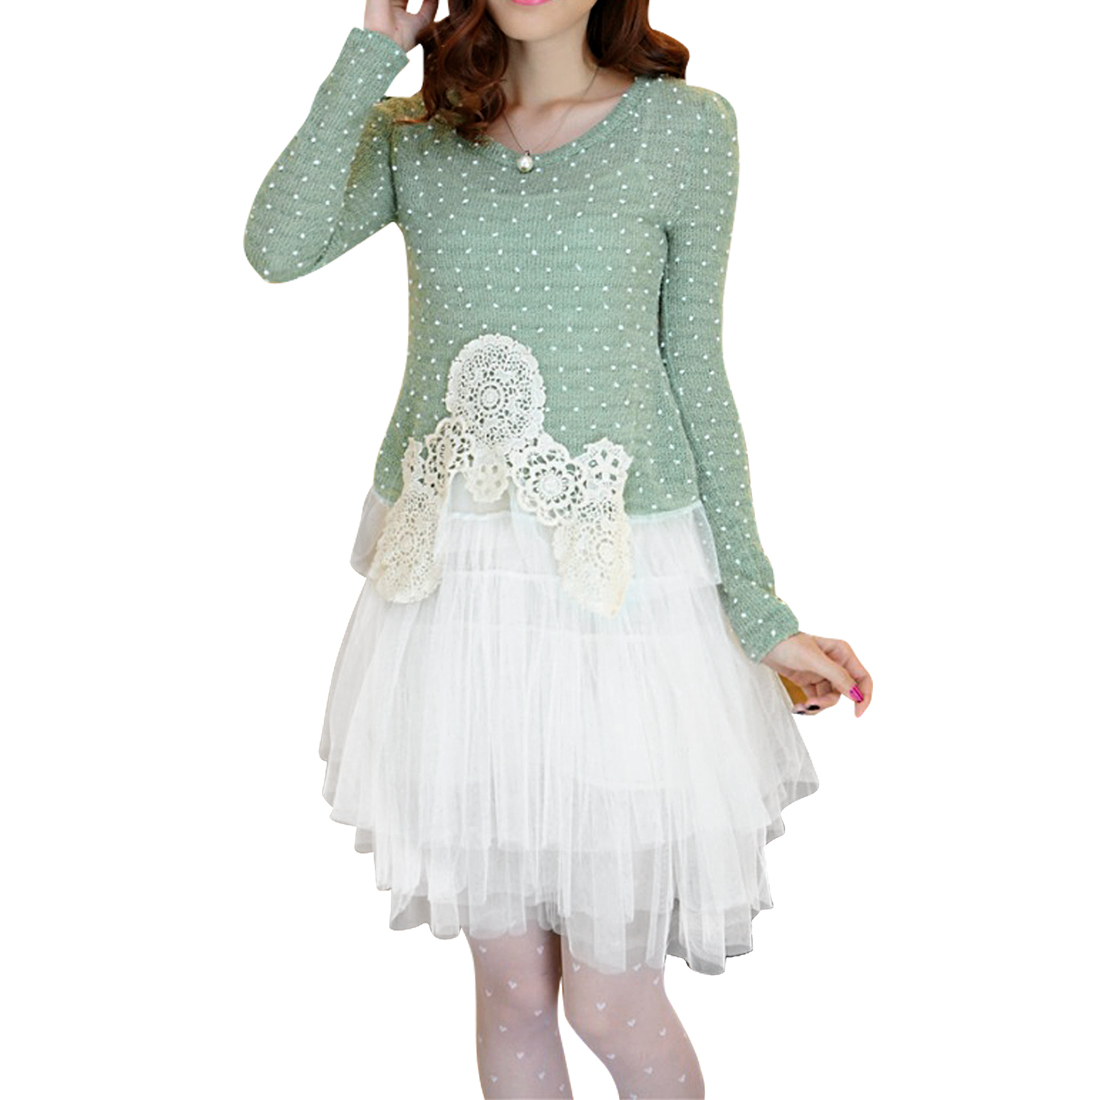 Dots Pattern Green Sweater w Tutu Tank Dress For Lady XS